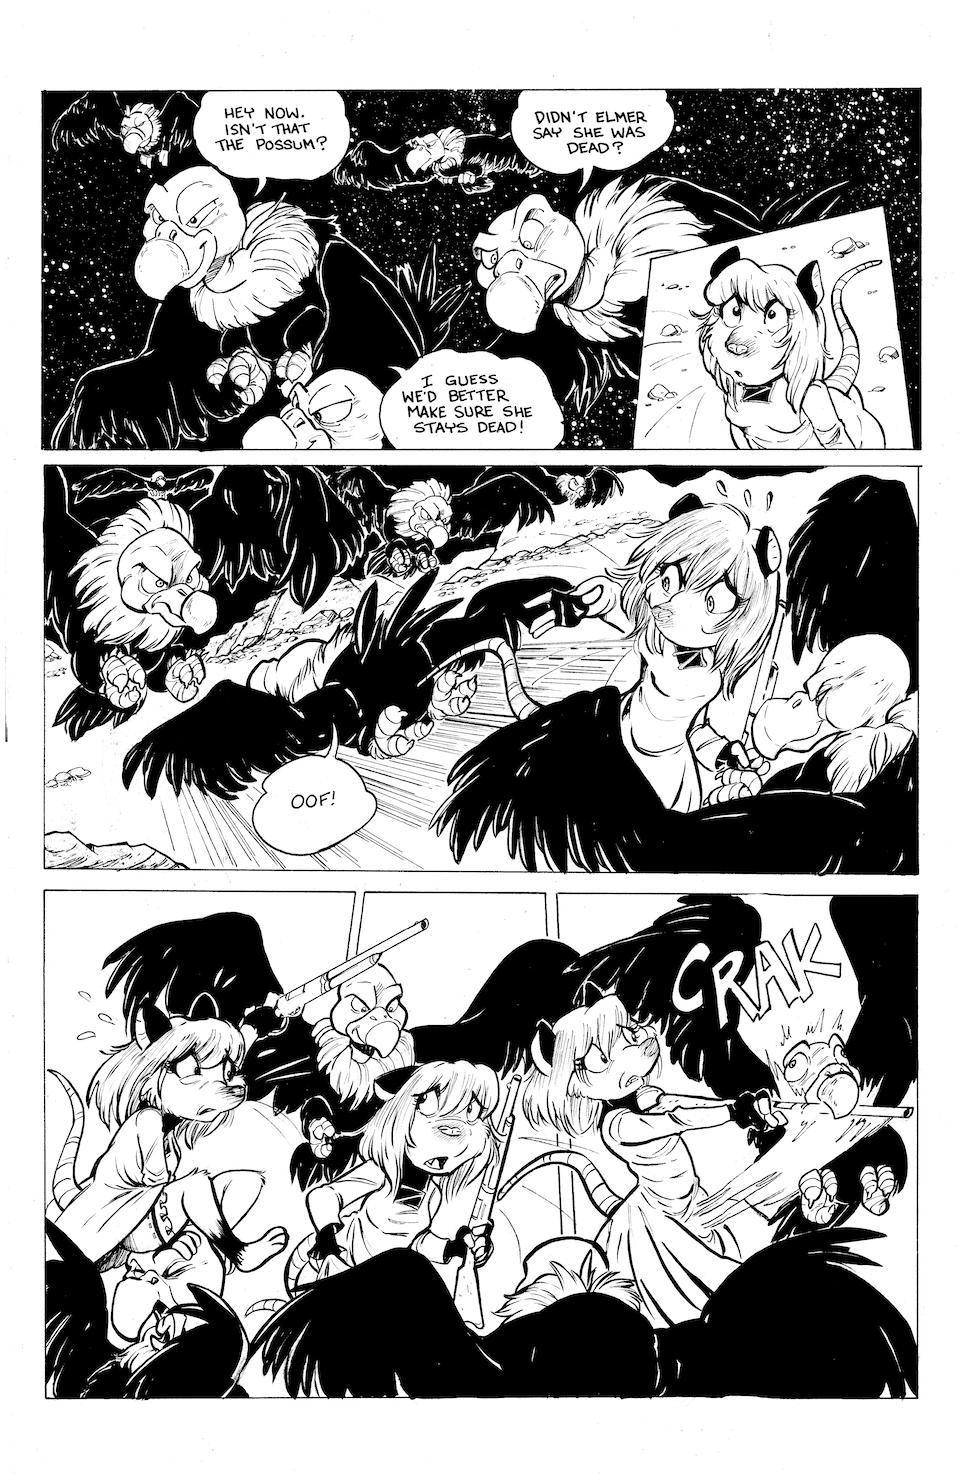 Jasper Gold 03 – pg. 20